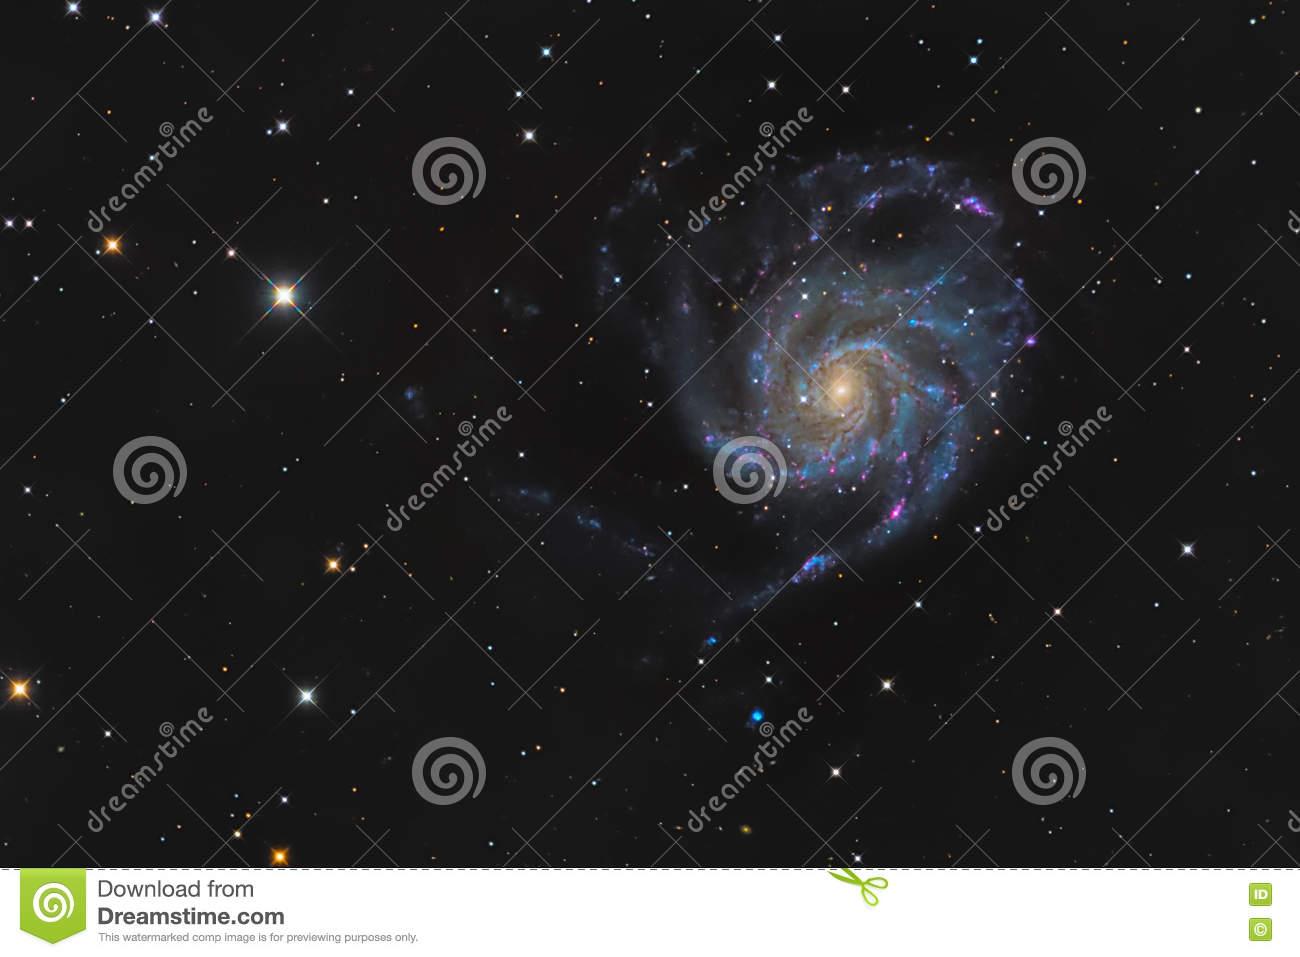 Messier 101 Or Pinwheel Galaxy In The Constellation Ursa Major.